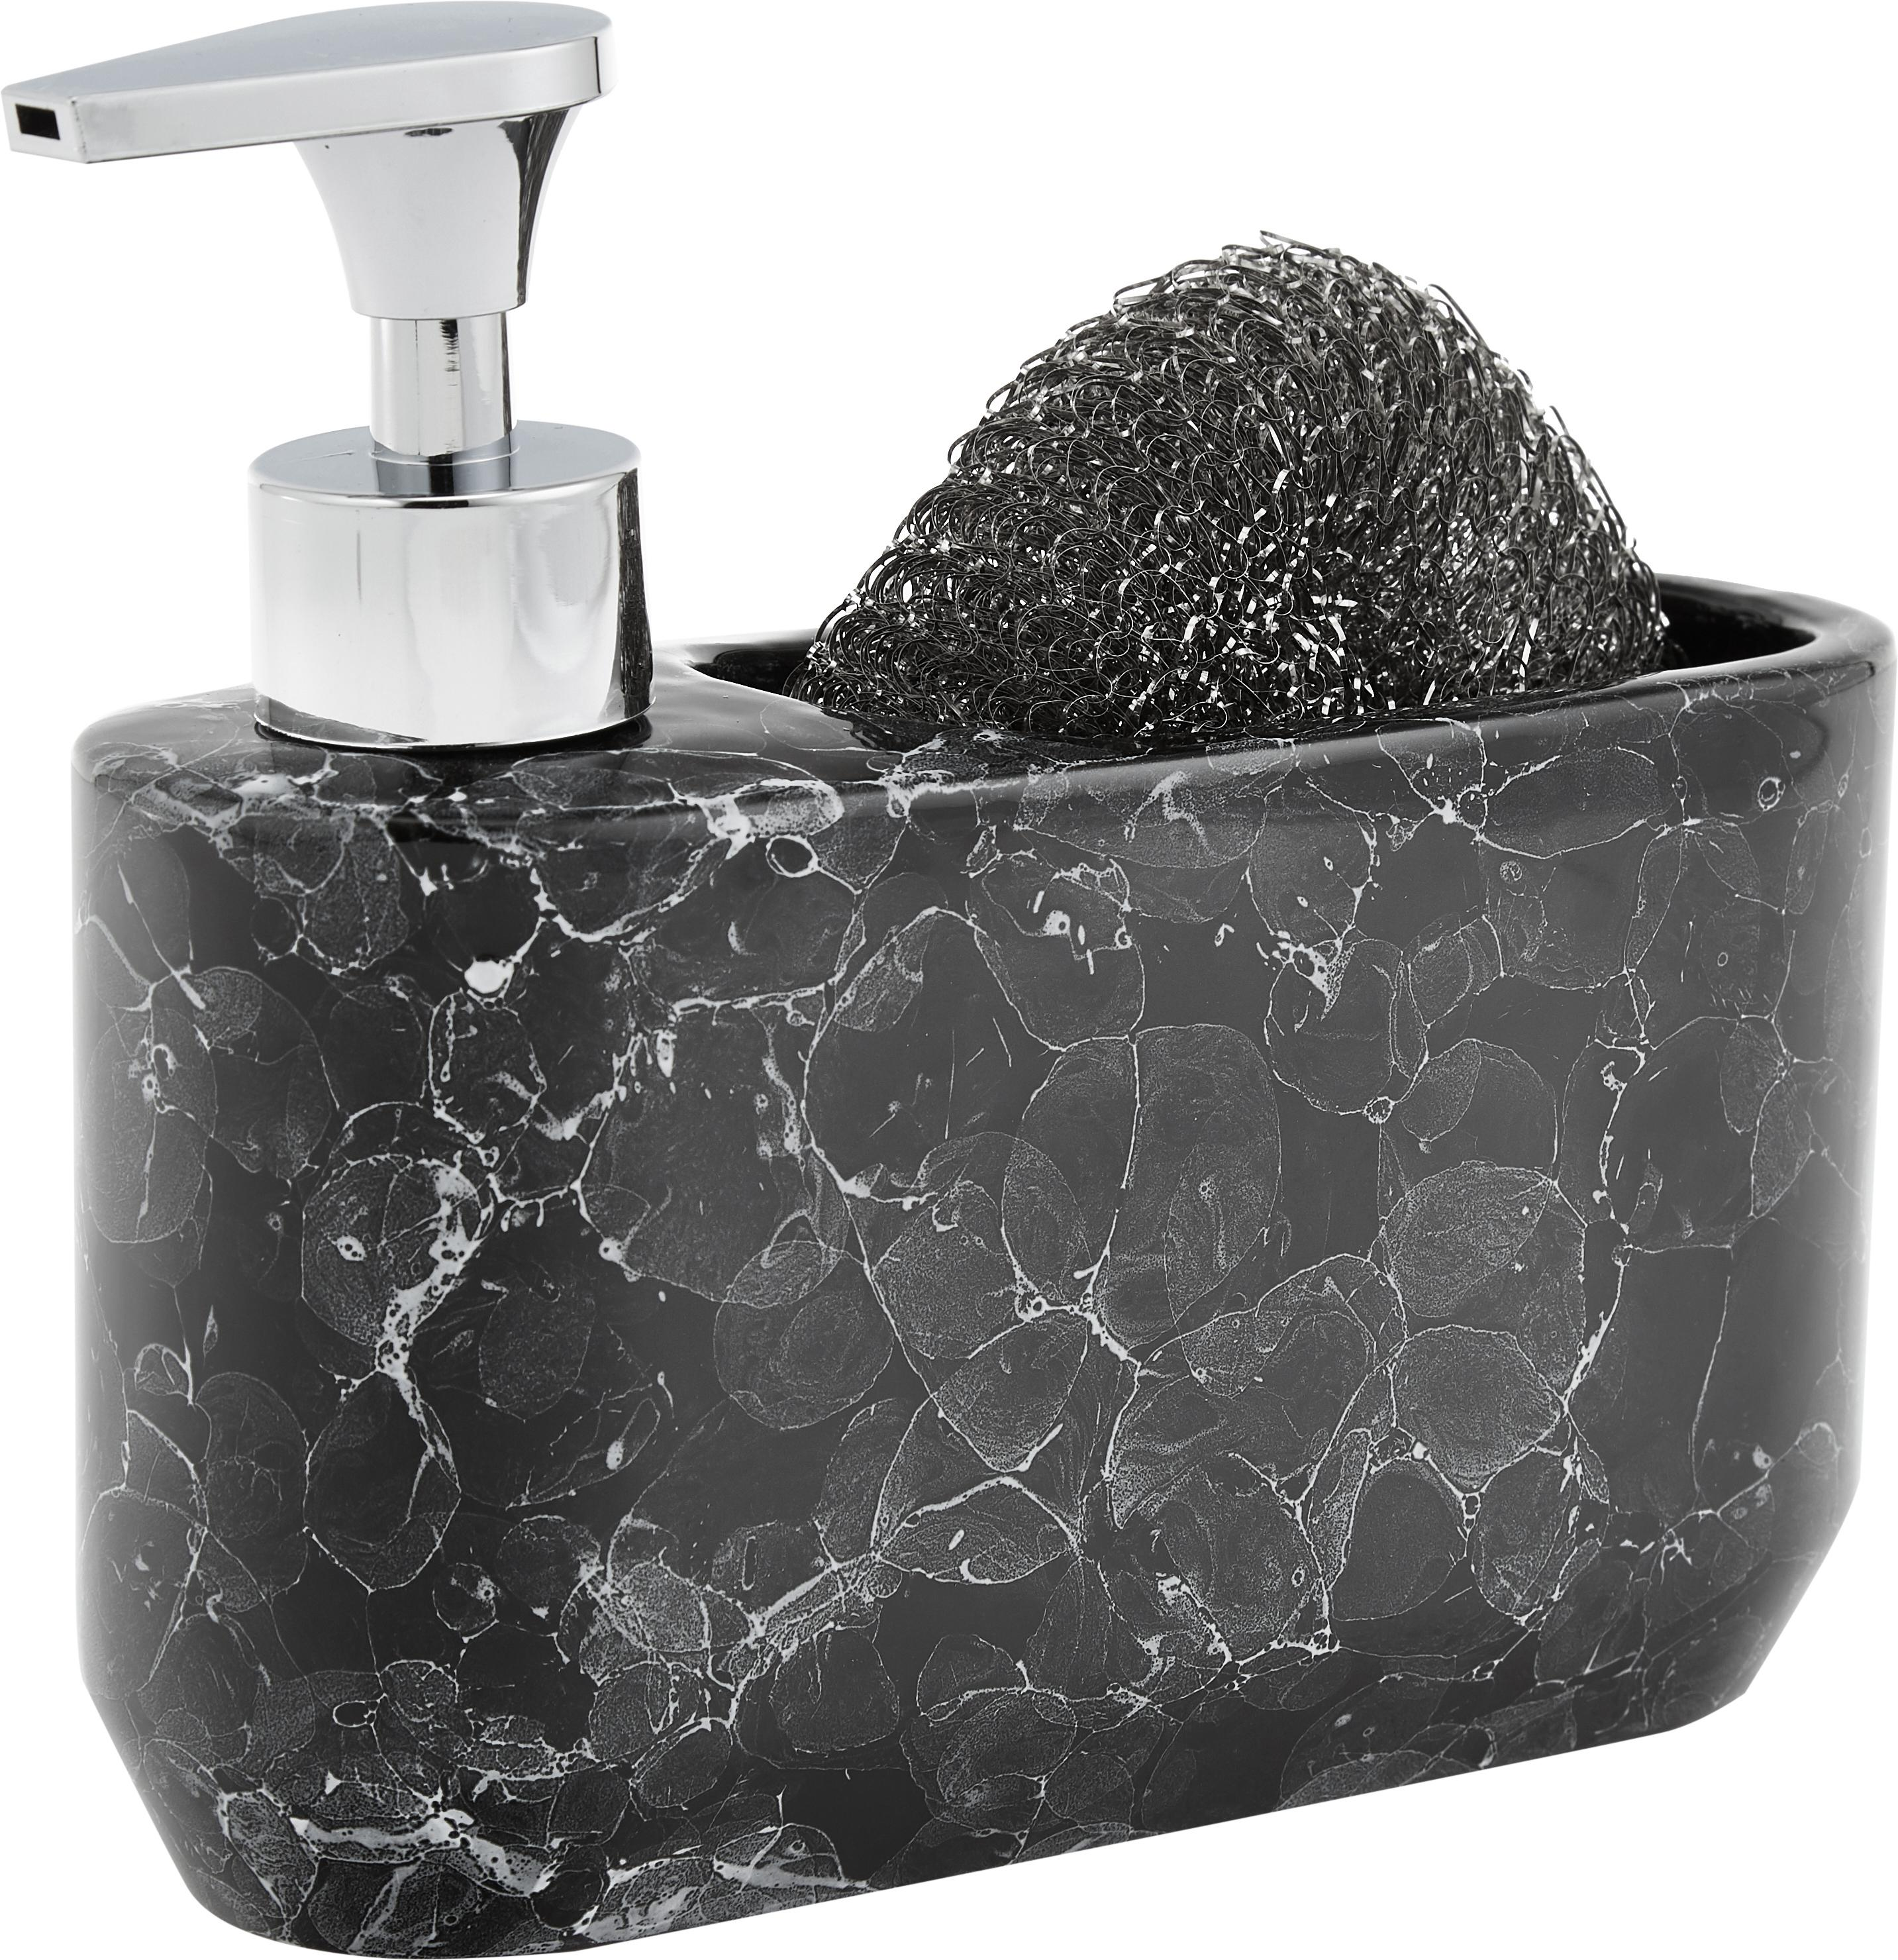 Seifenspender-Set Bubble in Marmor-Optik, 2-tlg., Behälter: Keramik Pumpkopf, Schwarz, Silberfarben, 19 x 16 cm